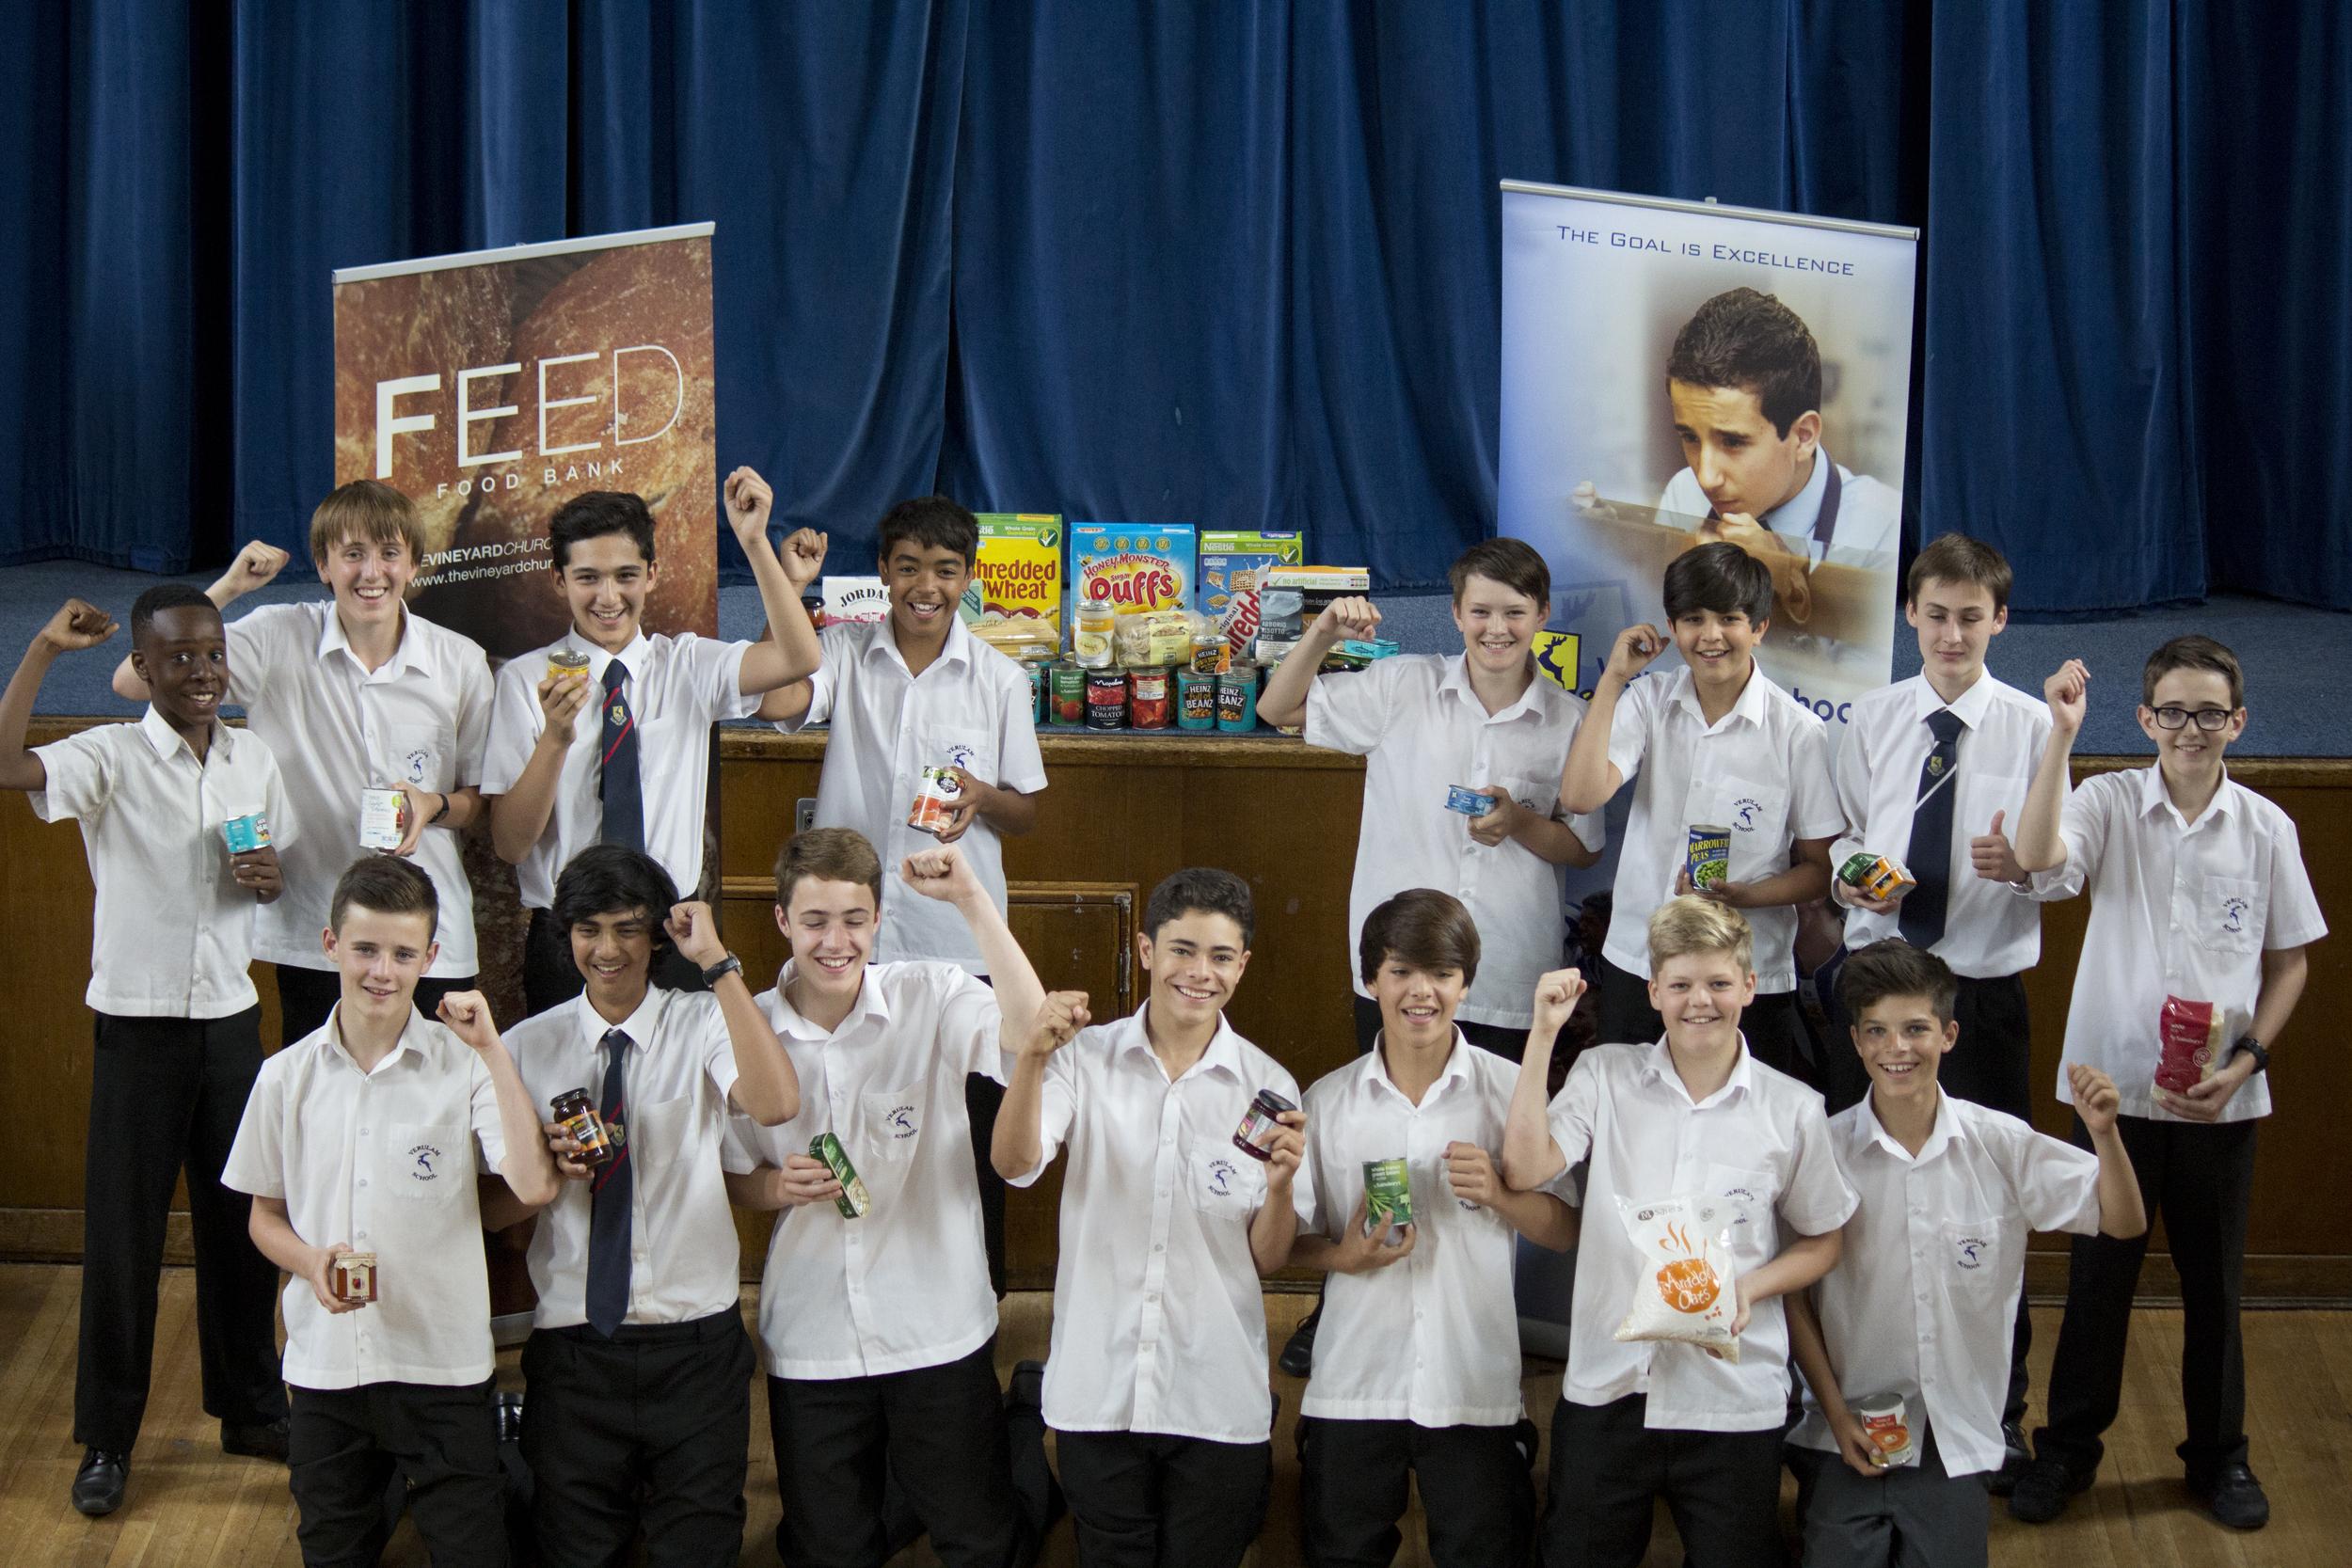 Verulam School FEED 2.jpg